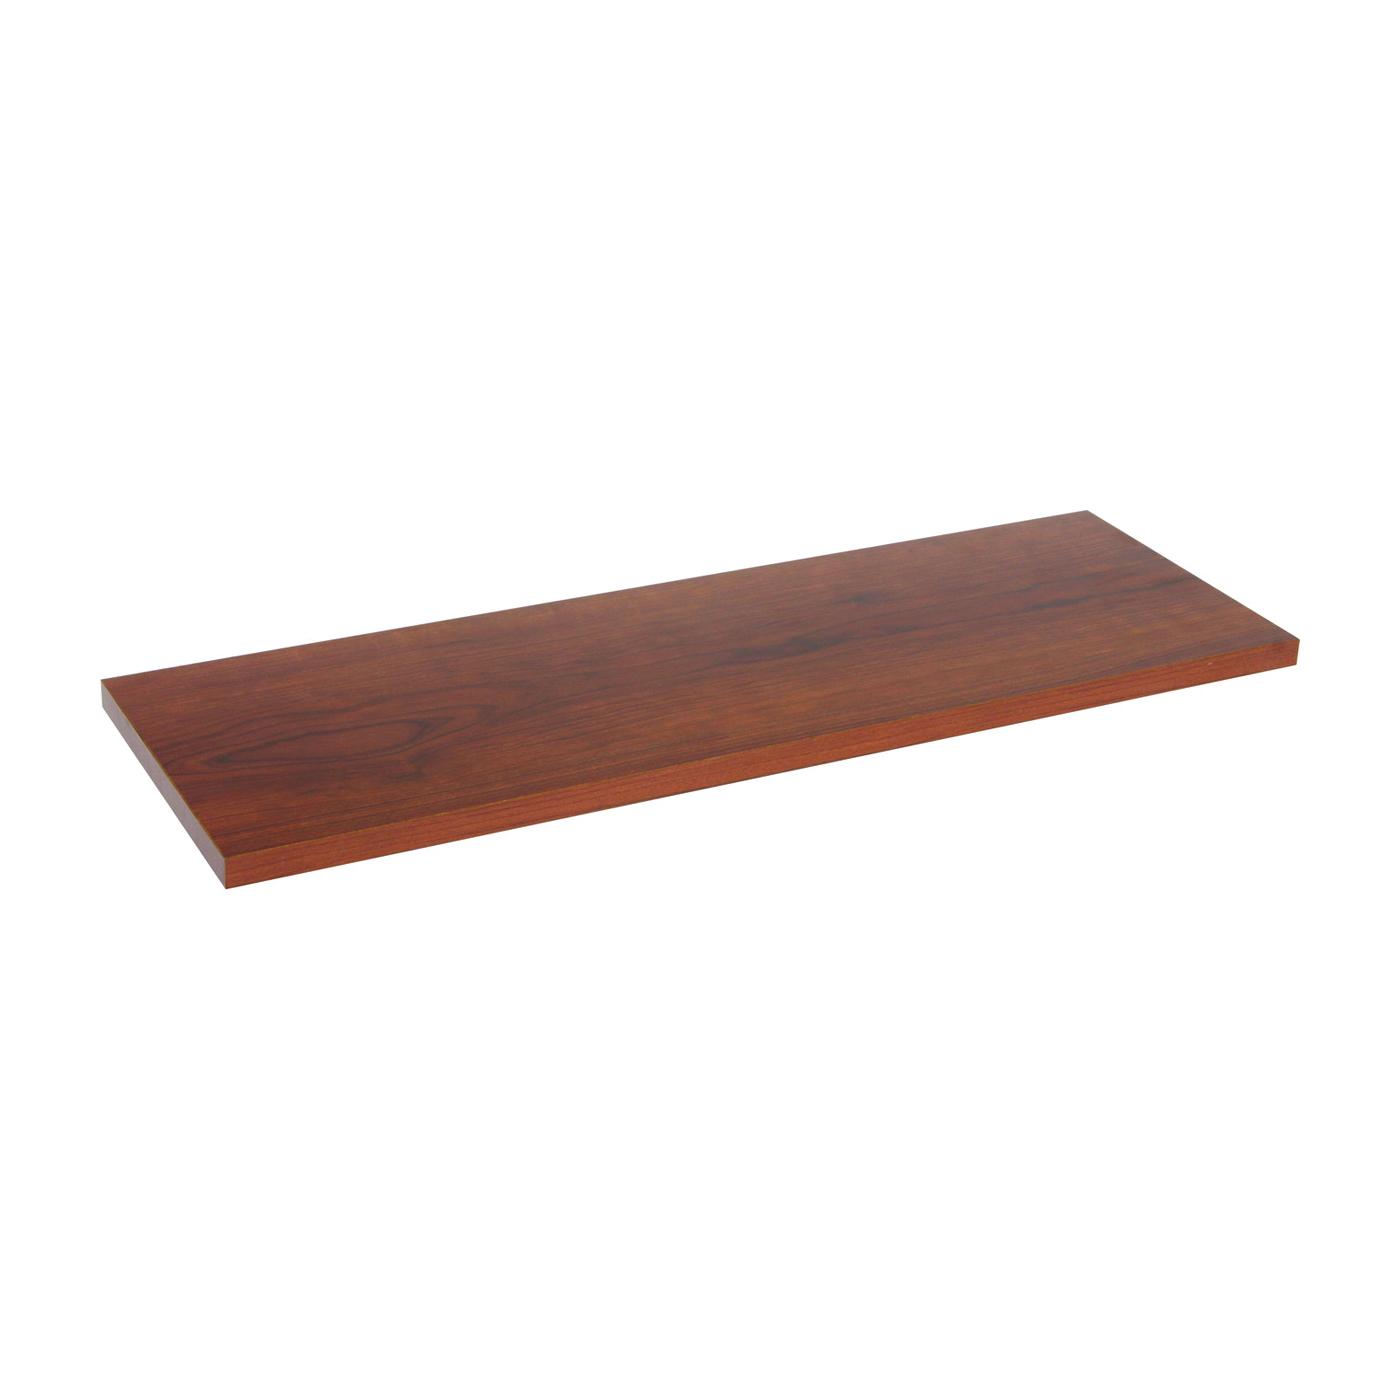 Picture of Knape & Vogt 1980 W 12X48 Shelf Board, 200 lb, 5-Shelf, 48 in L, 12 in W, Particleboard